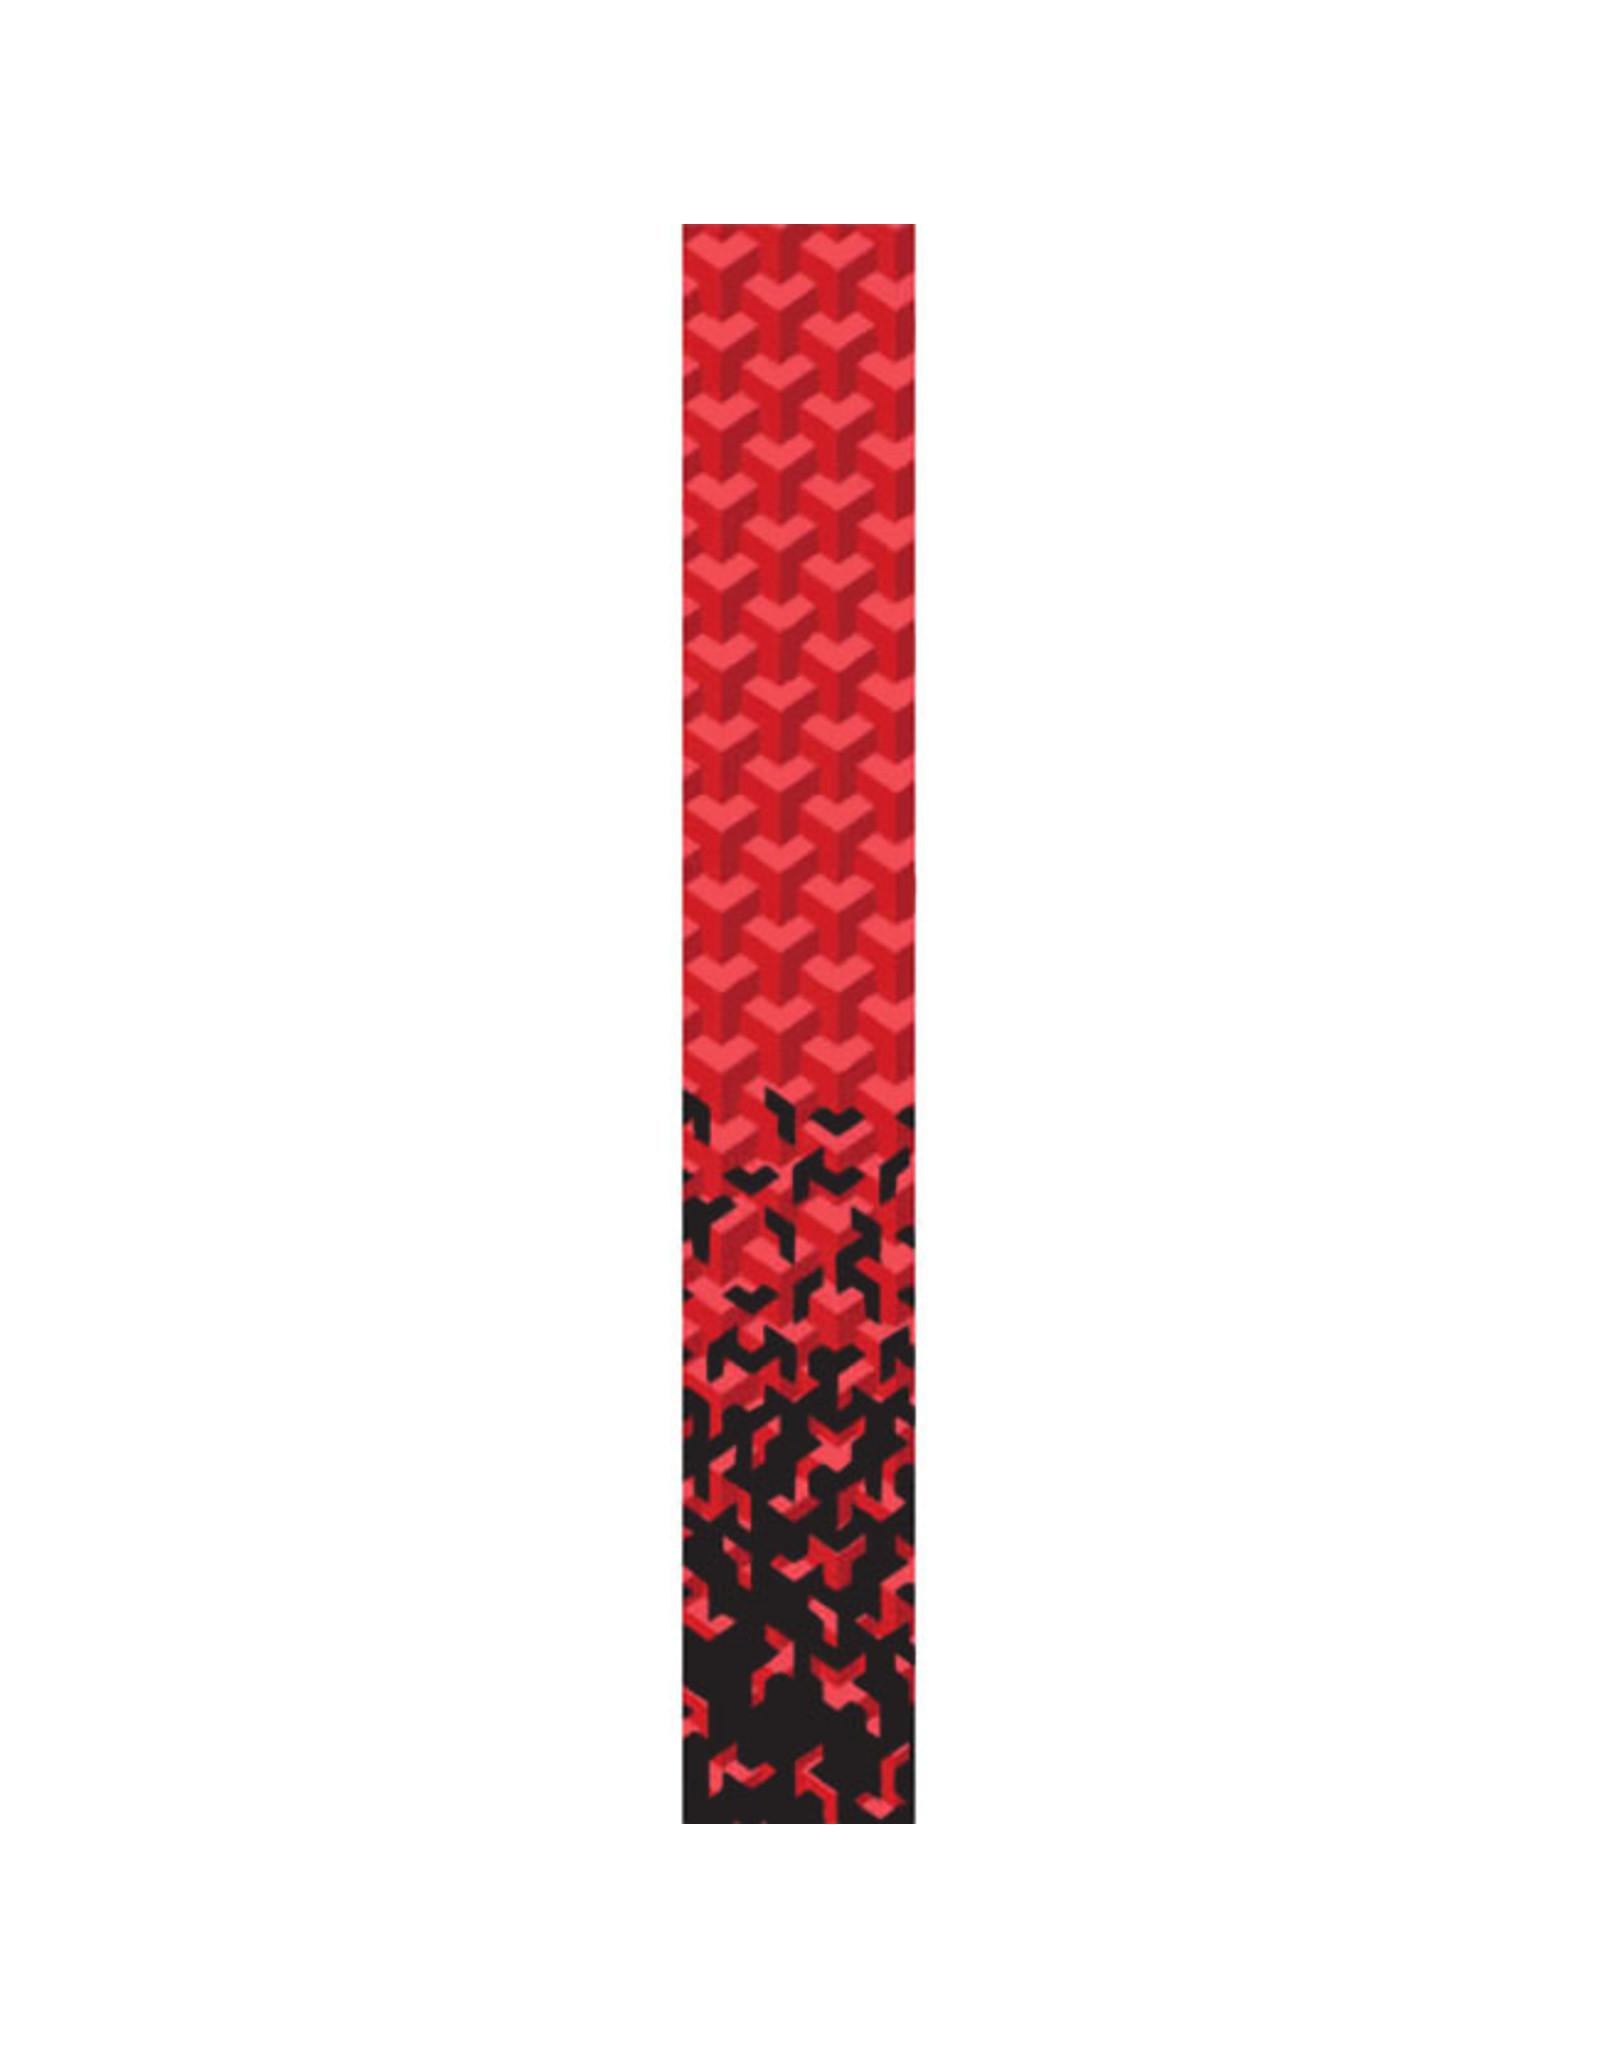 Arundel Arundel Art Gecko Handlebar Tape